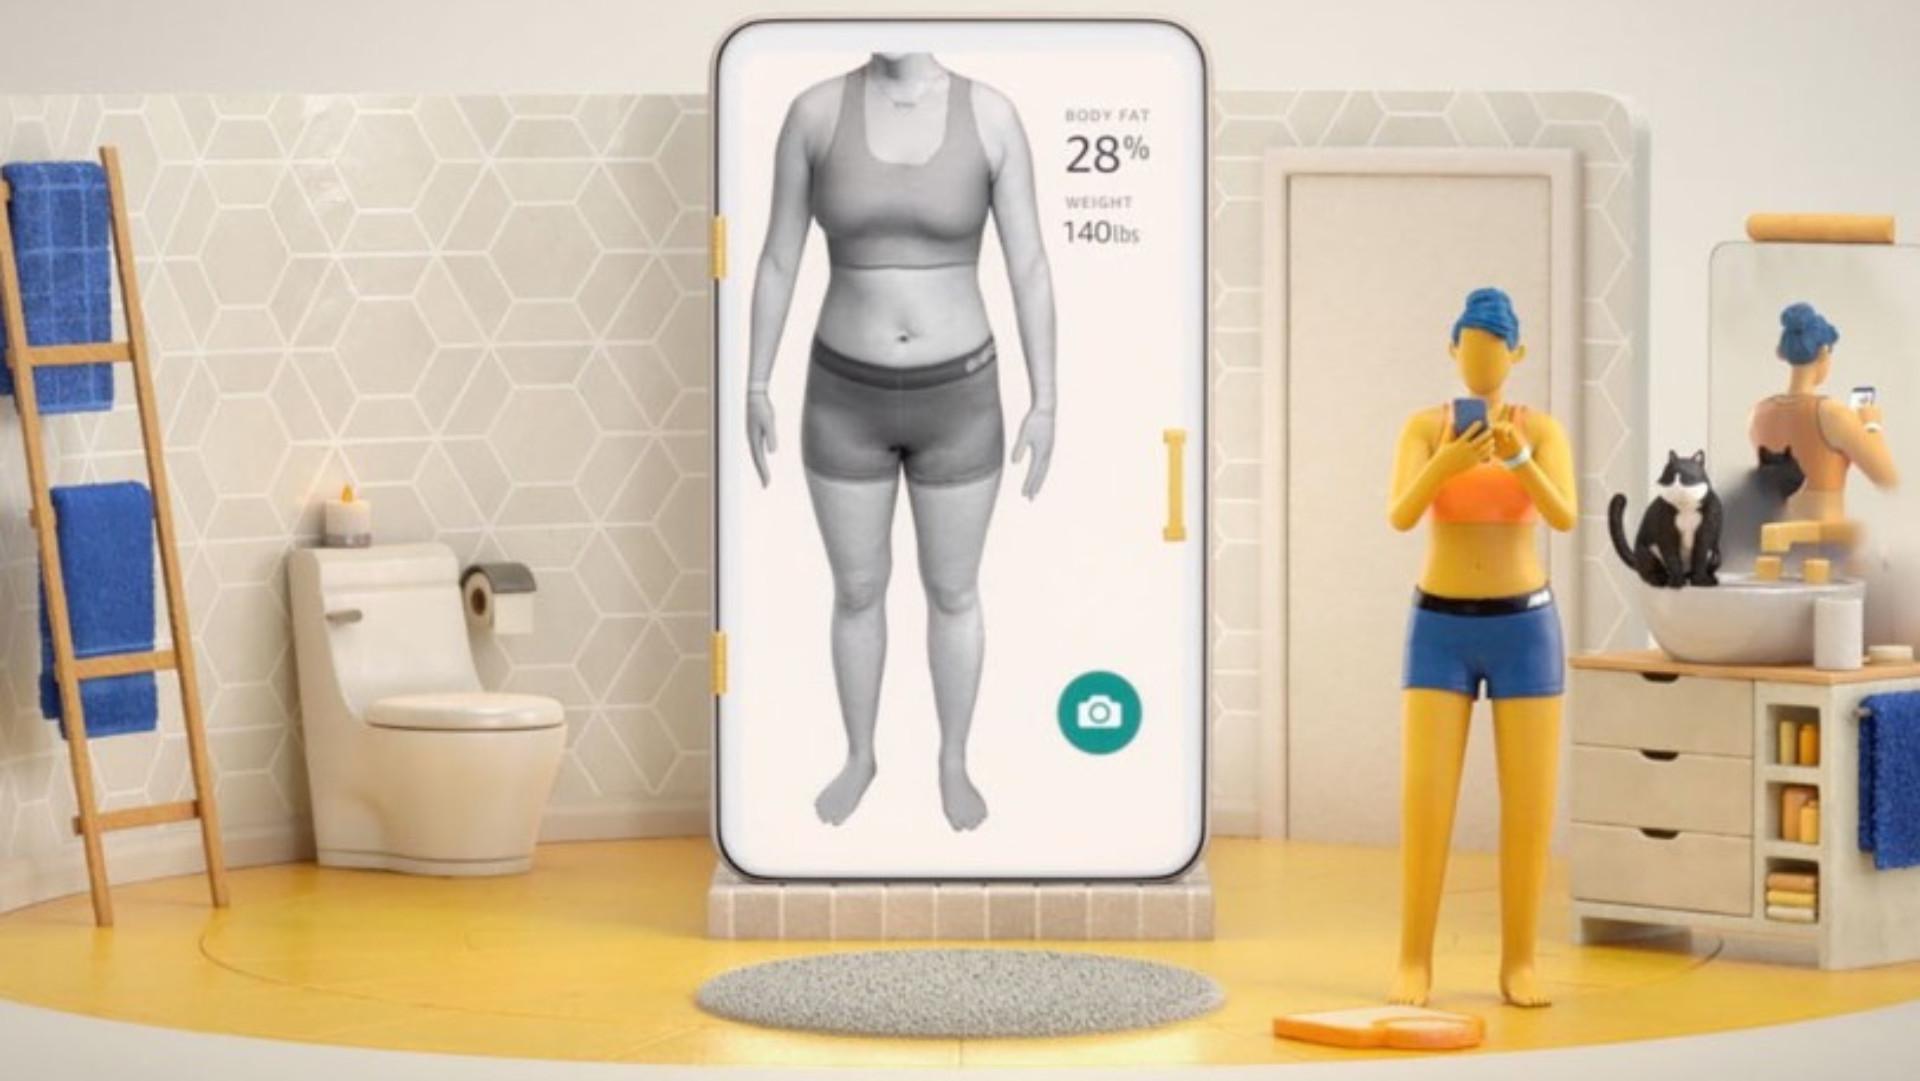 Amazon Halo Body feature